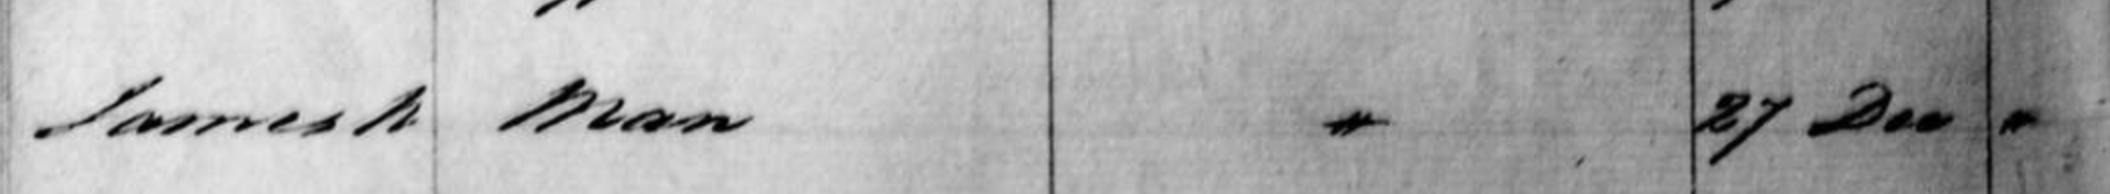 James N Man 27 Dec 1838